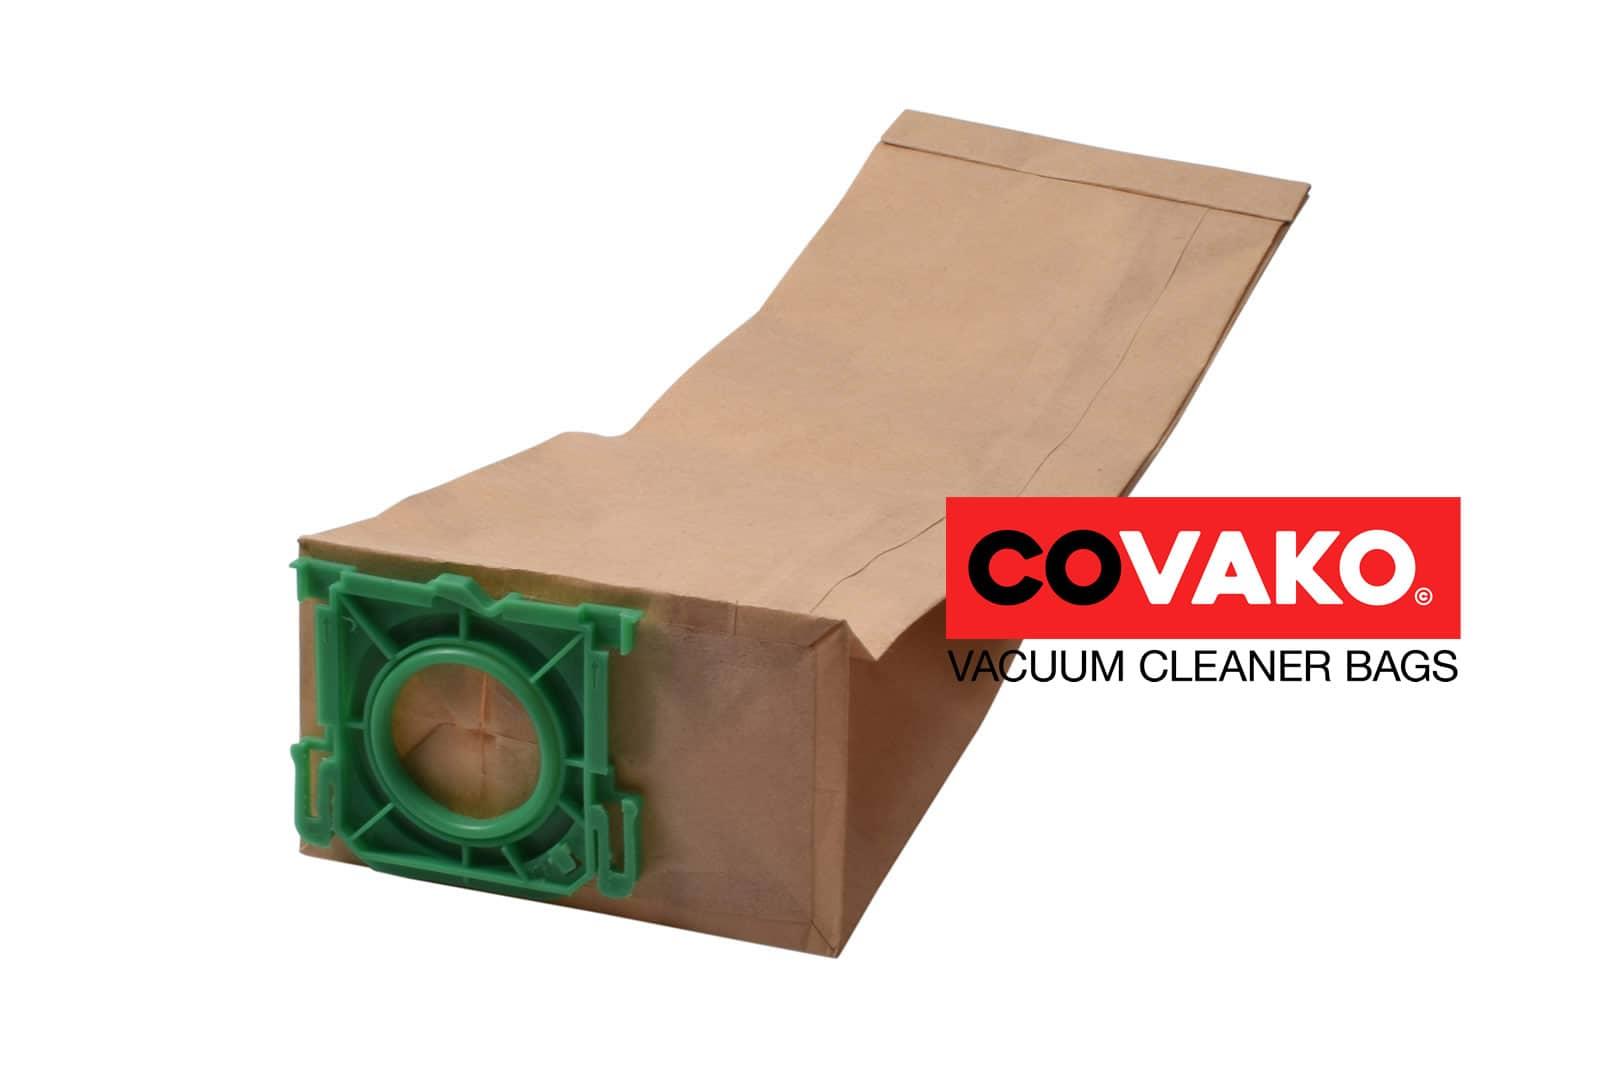 Numatic 370 / Paper - Numatic vacuum cleaner bags